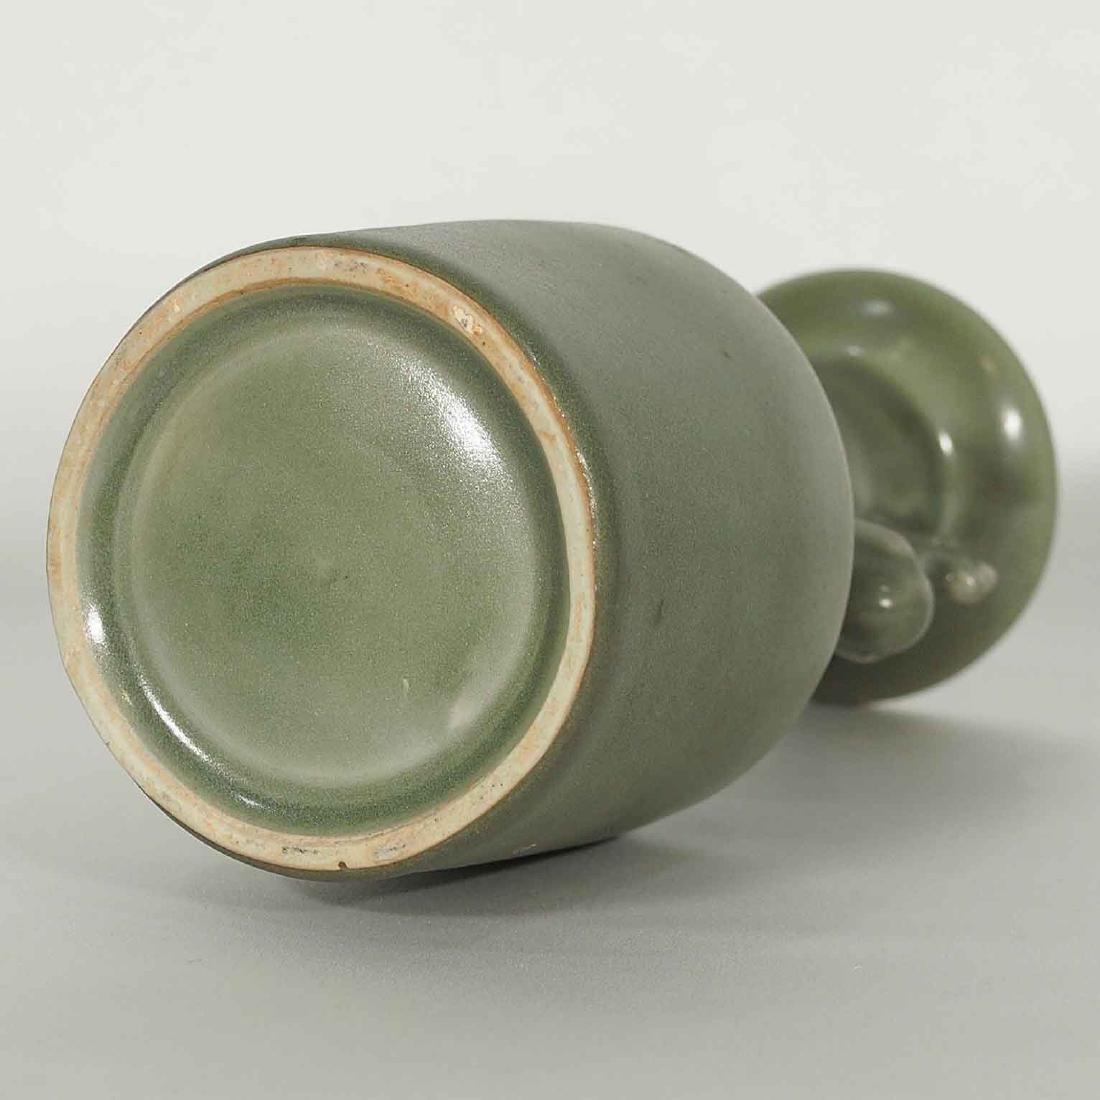 Longquan 'Kinuta' Mallet Vase, Southern Song Dynasty - 7